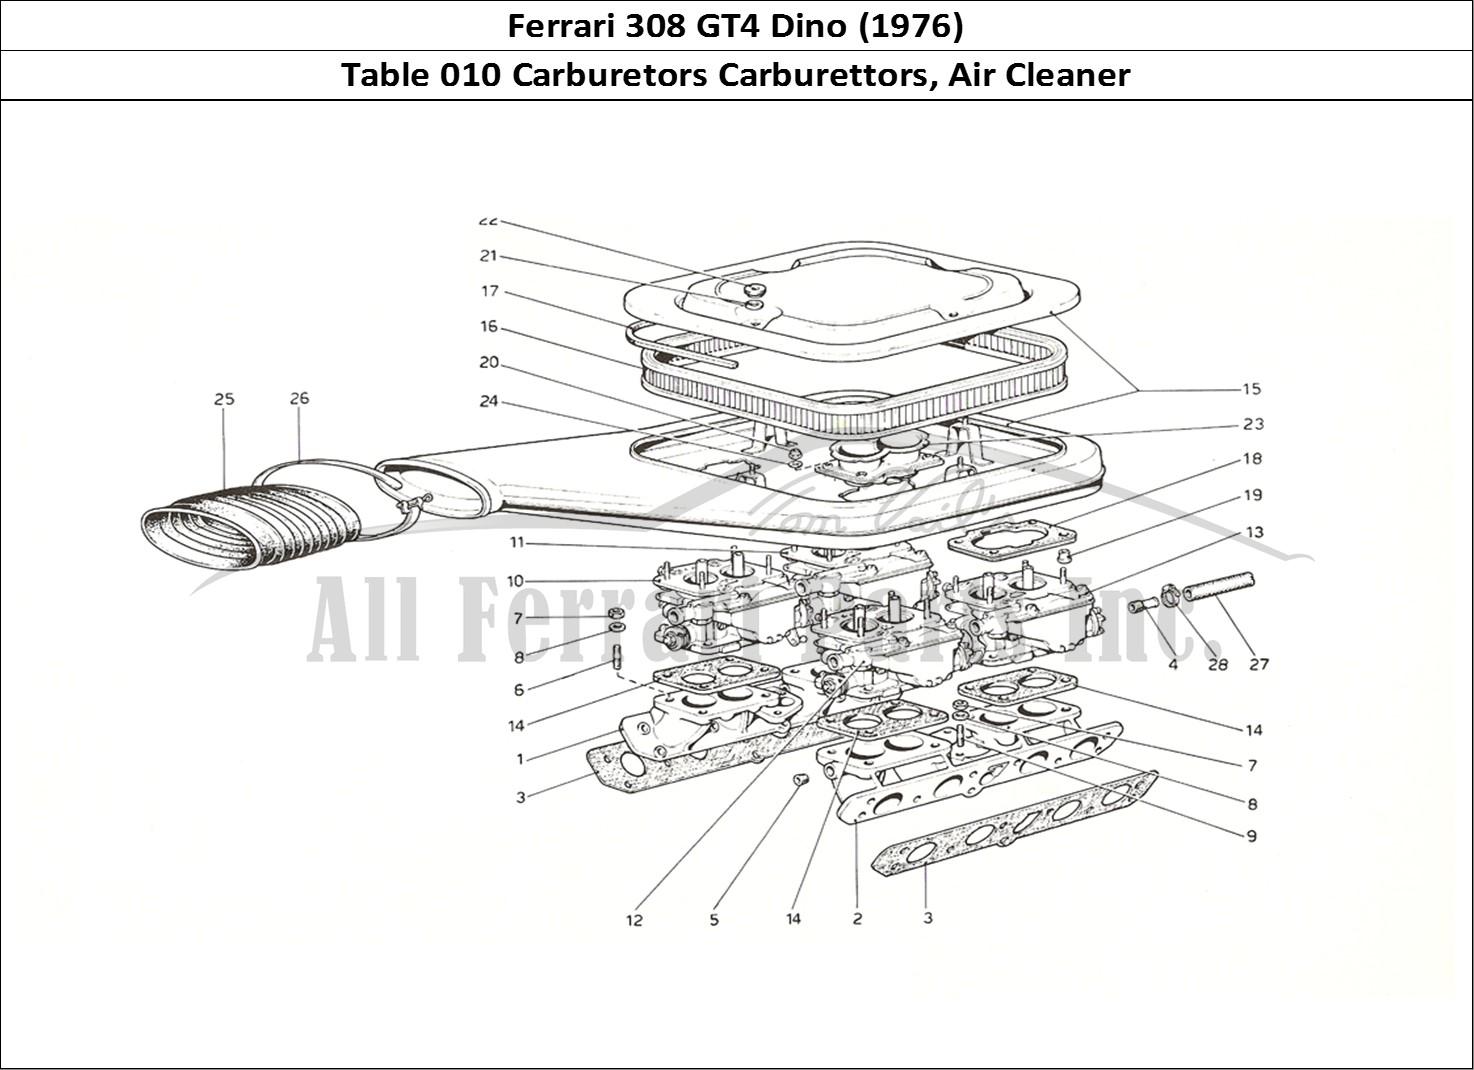 Buy original Ferrari 308 GT4 Dino (1976) 010 Carburetors